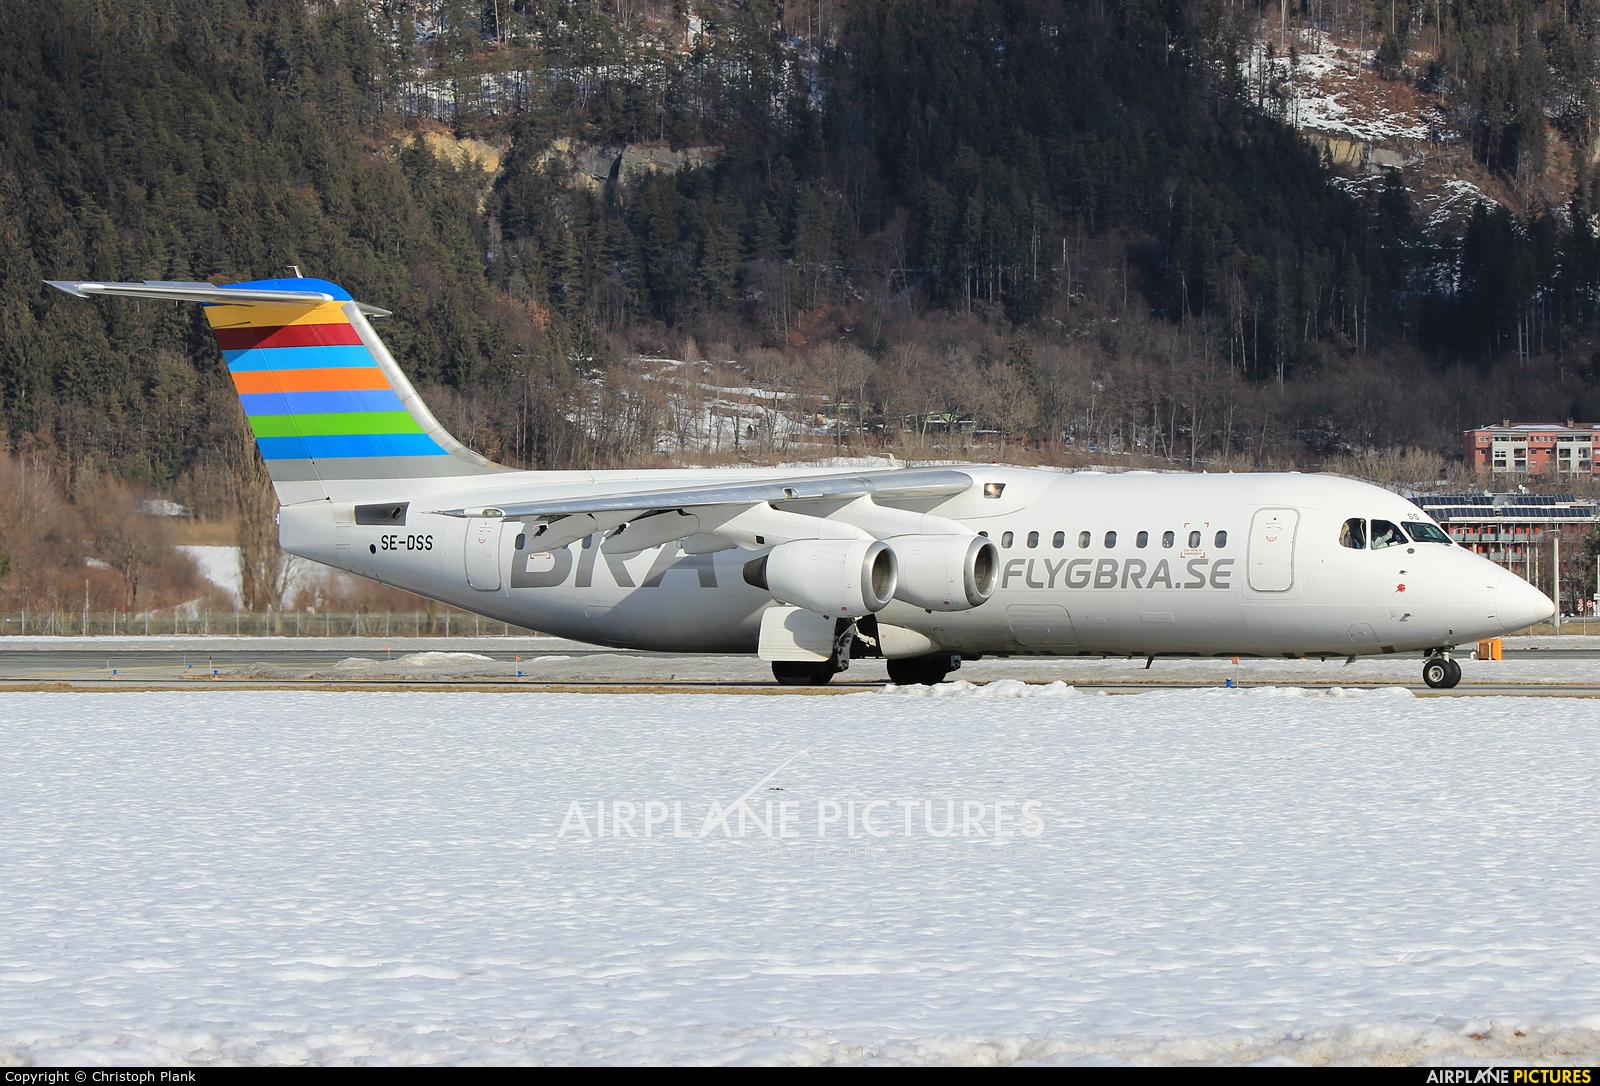 BRA (Sweden) SE-DSS aircraft at Innsbruck